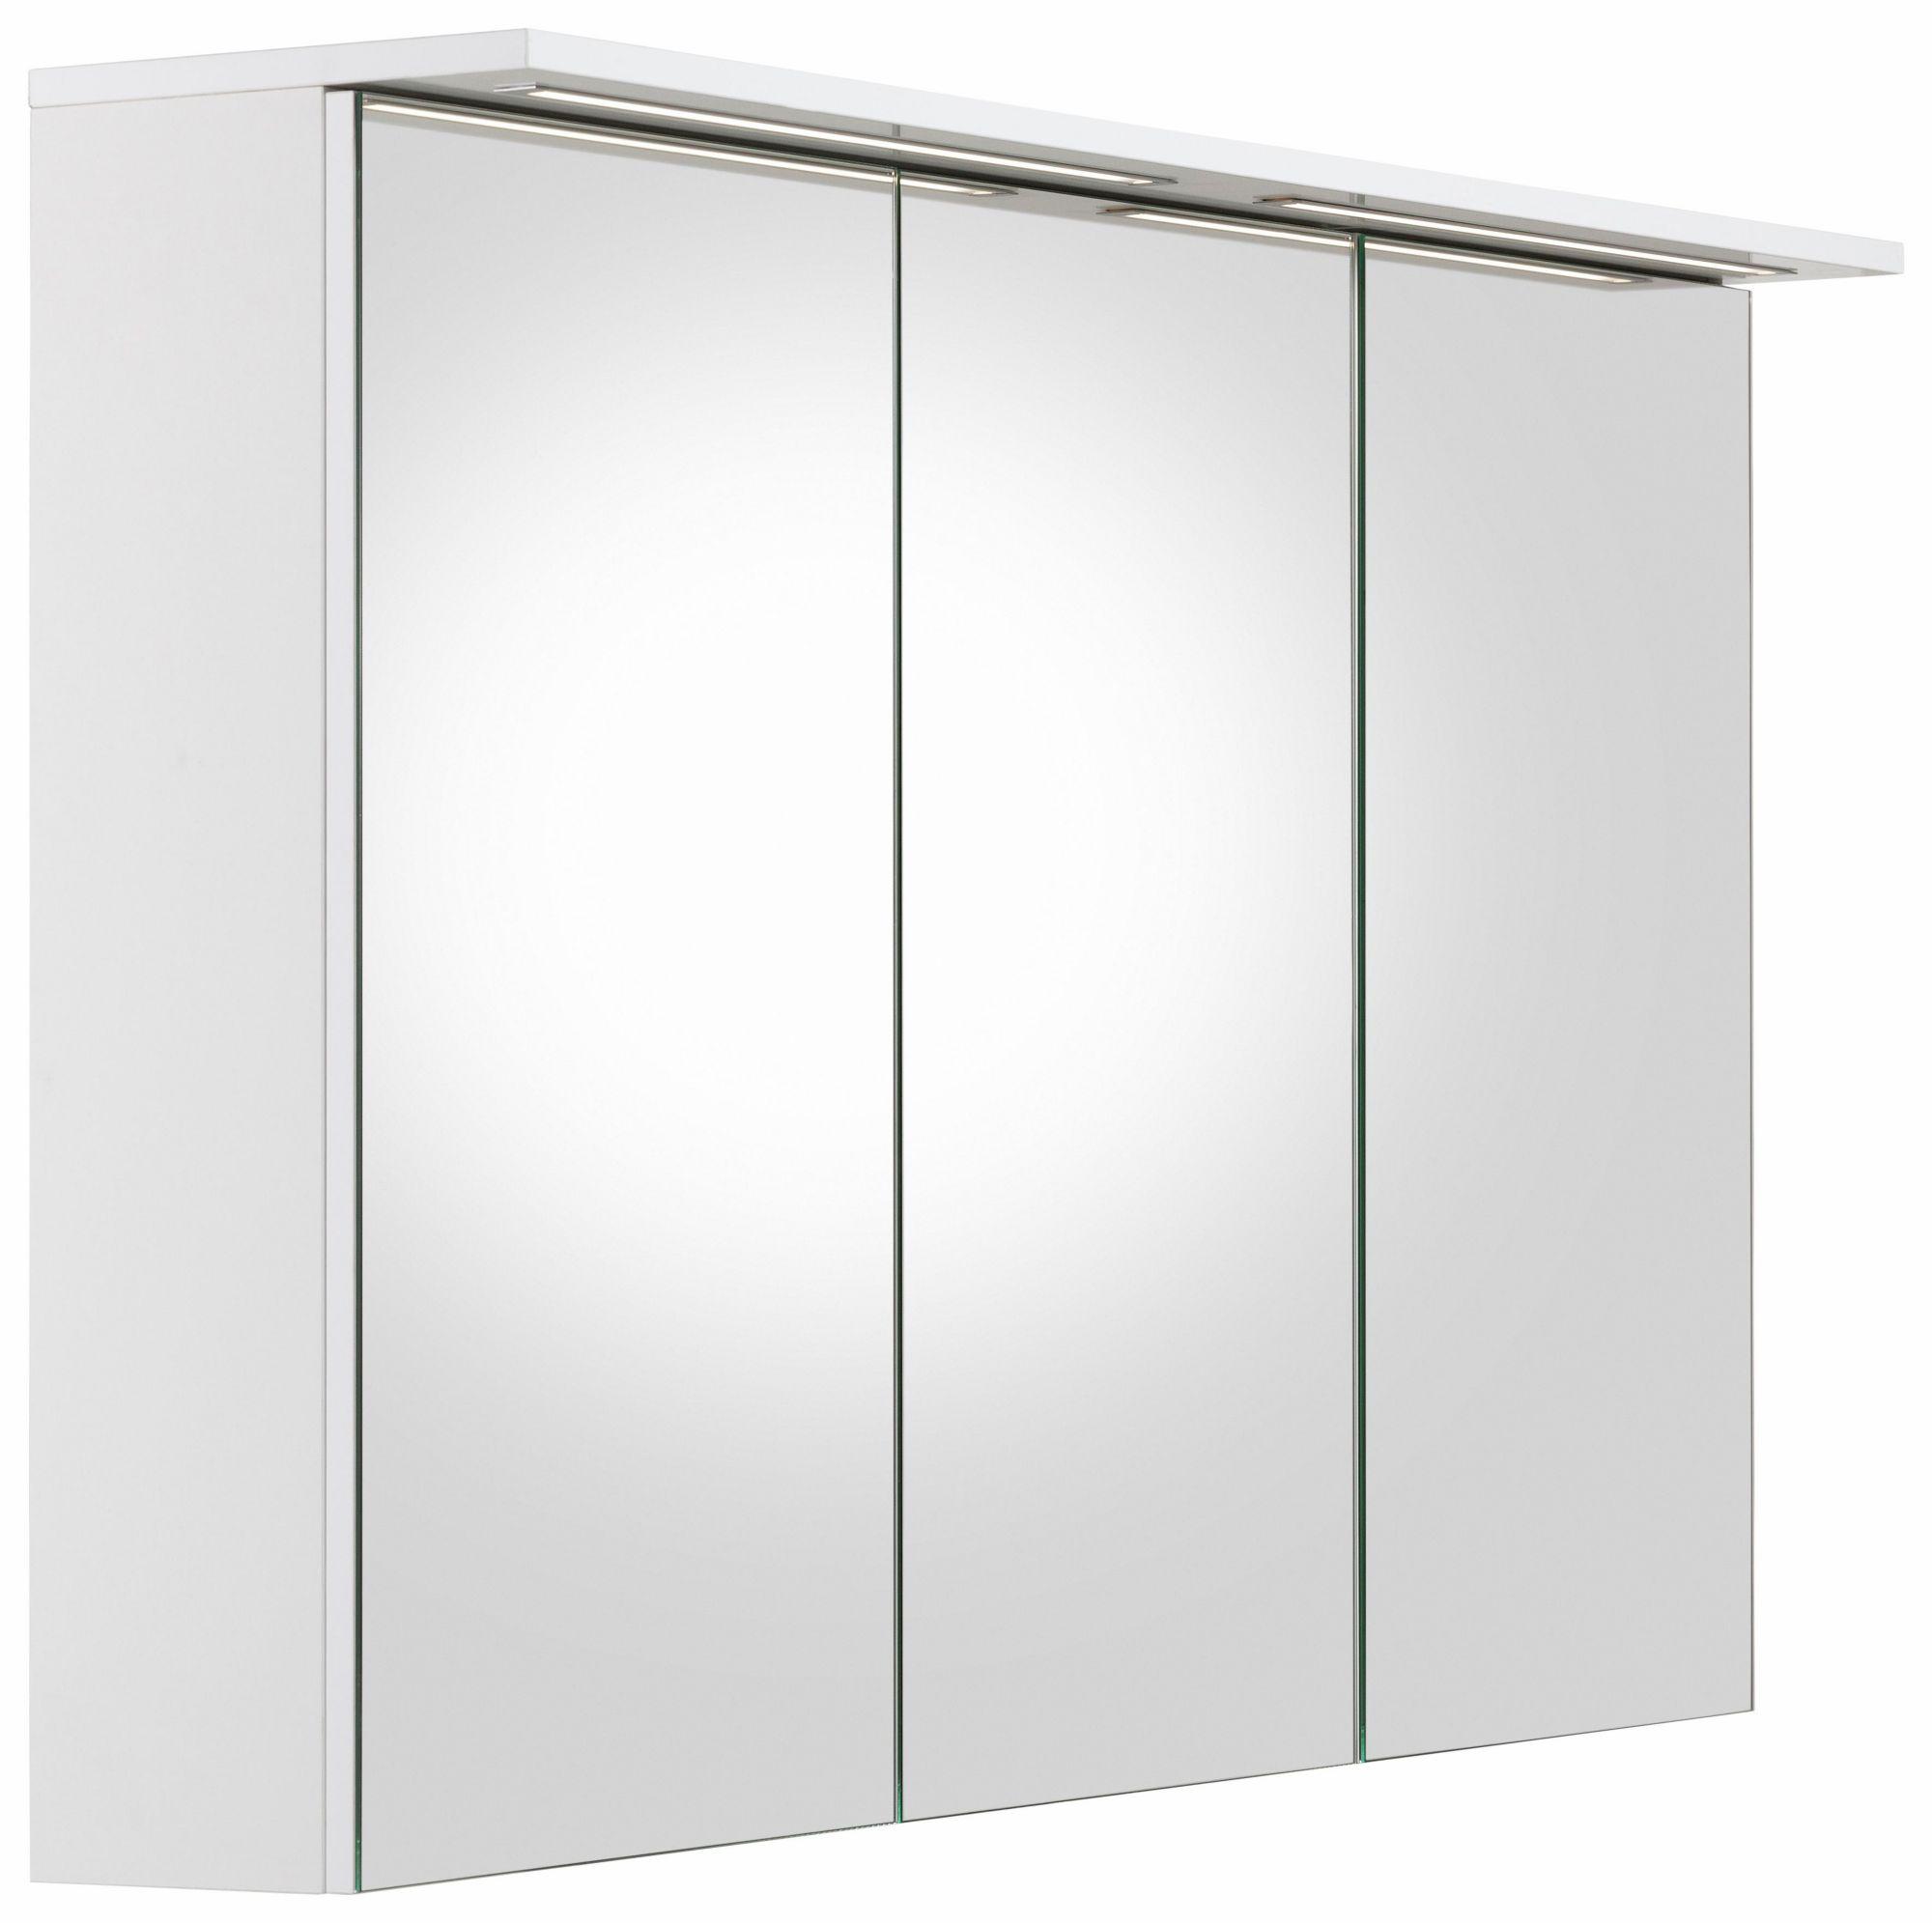 schildmeyer spiegelschrank merle mit led beleuchtung. Black Bedroom Furniture Sets. Home Design Ideas